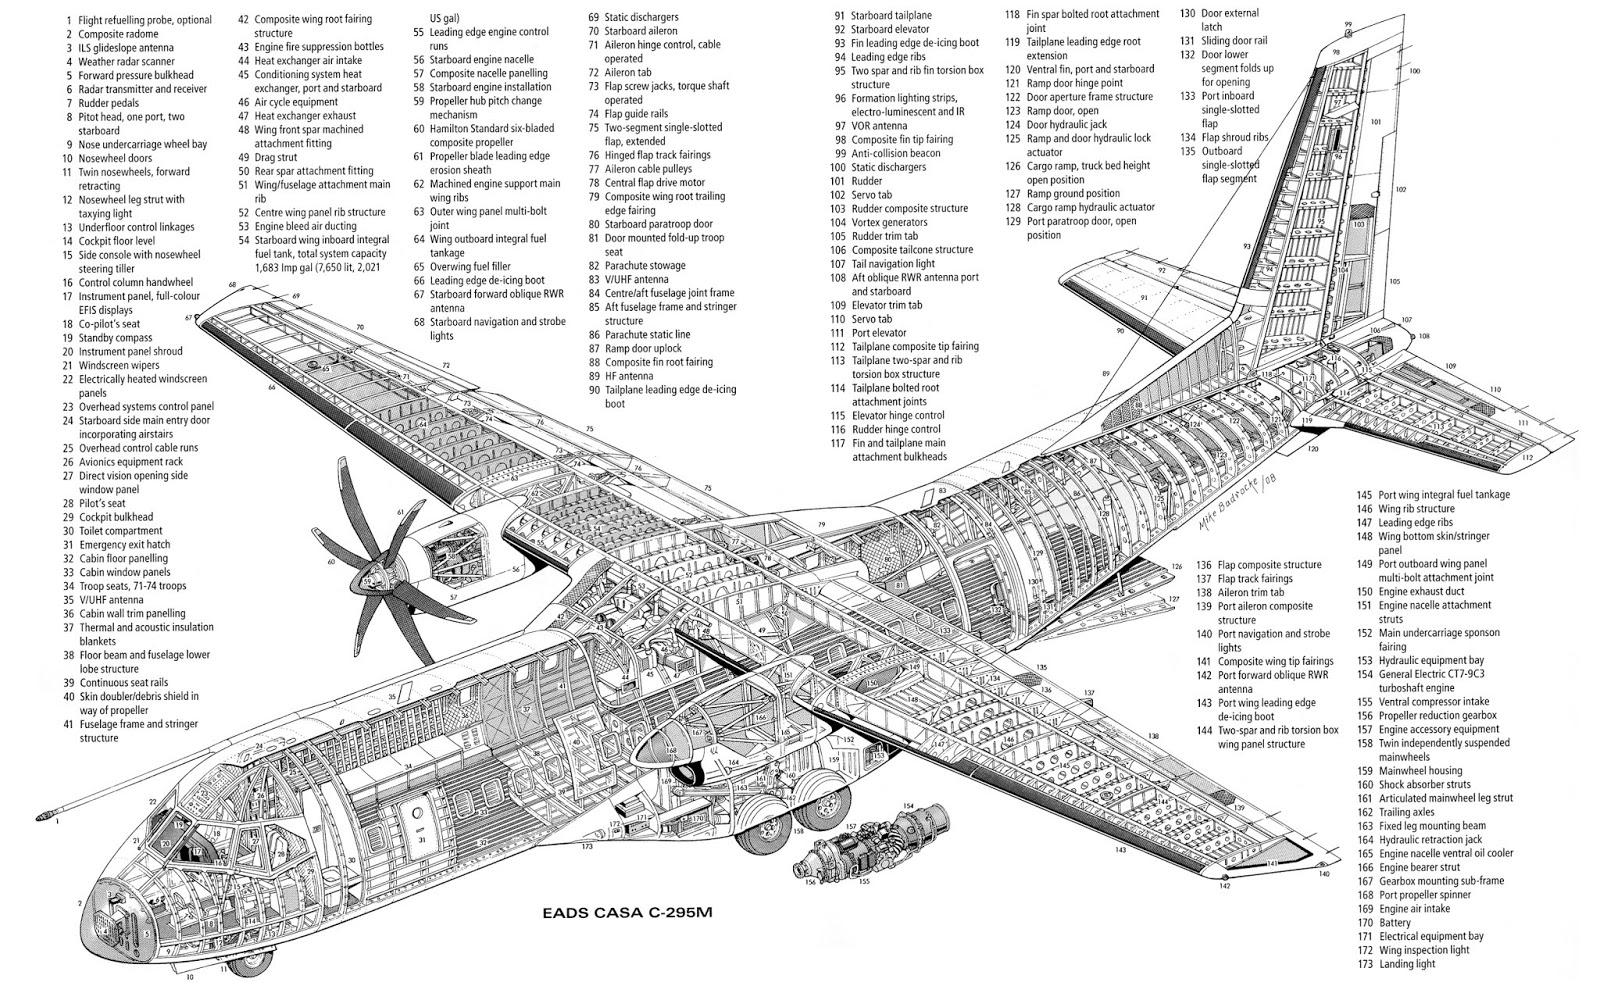 Airplane Scale Modelkit Casa C 295m